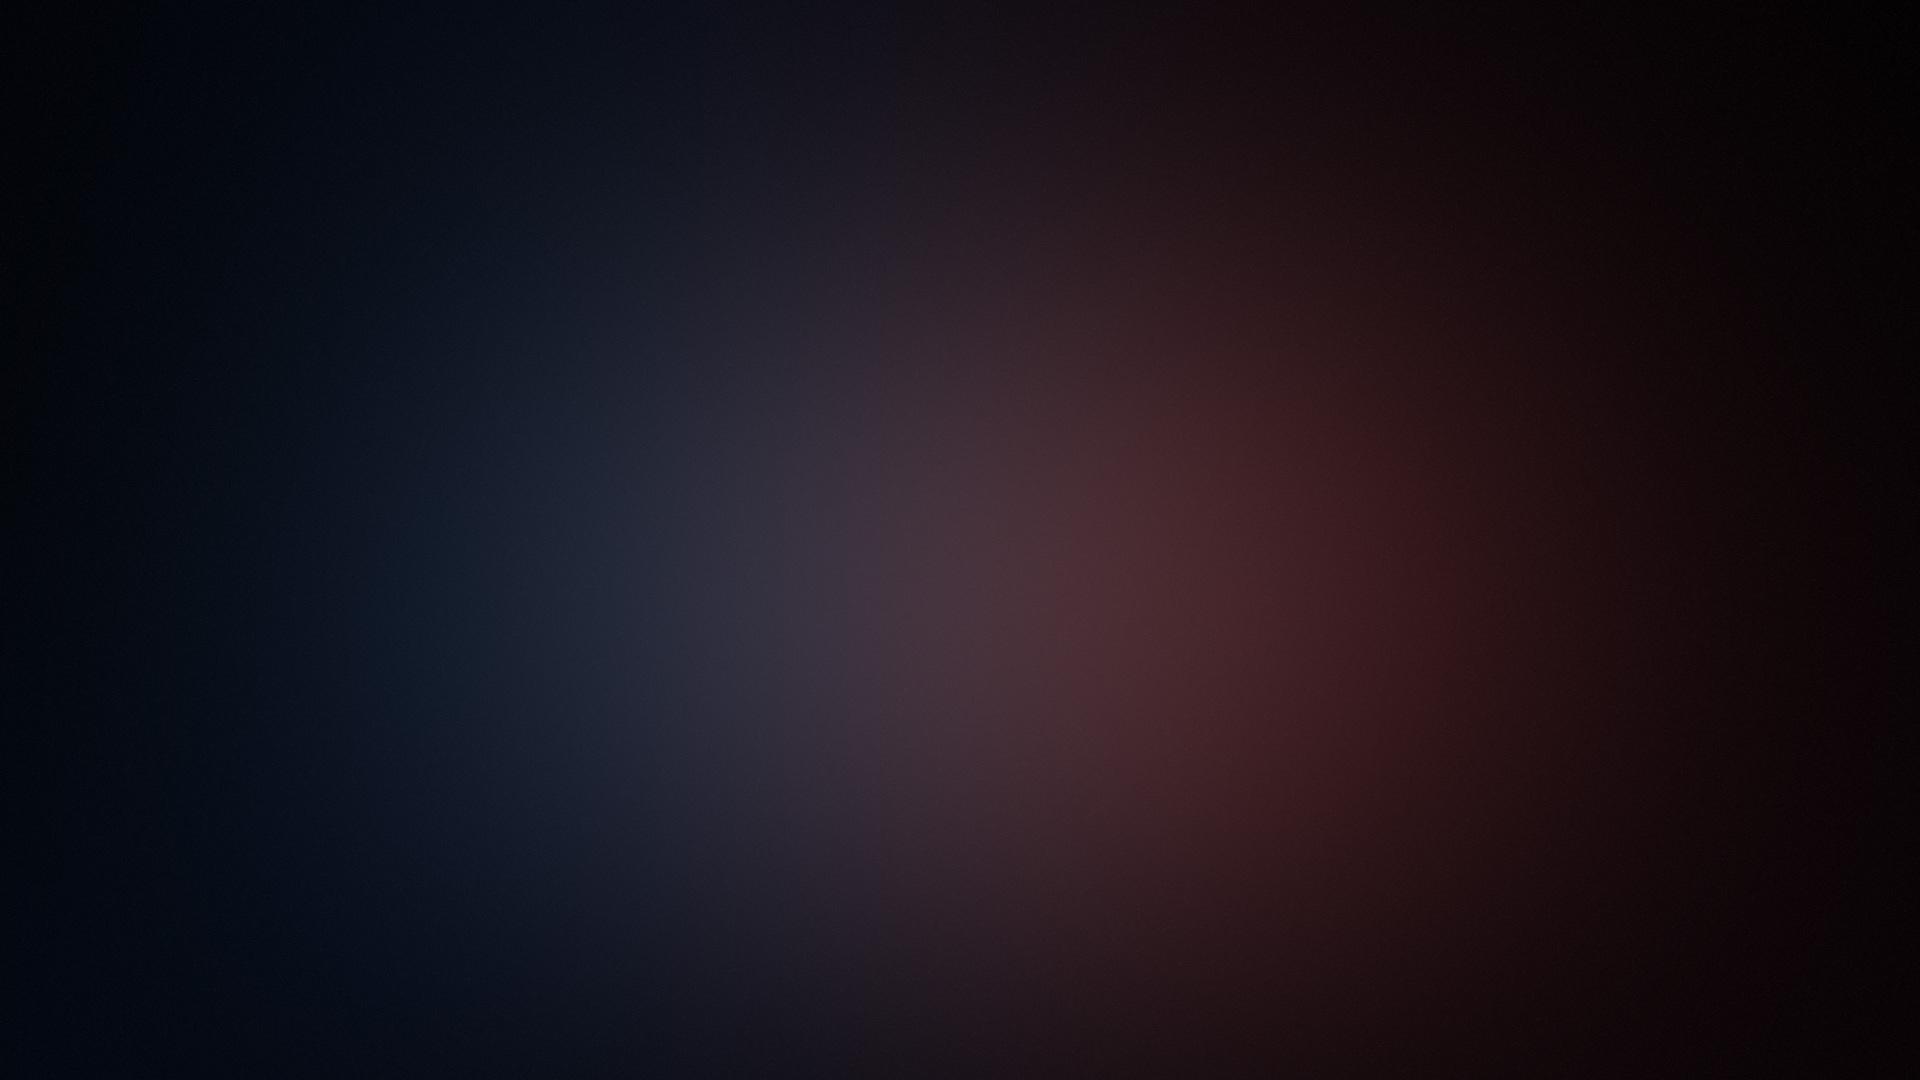 1920x1080 Simple Subtle Abstract Dark Minimalism 4k Laptop